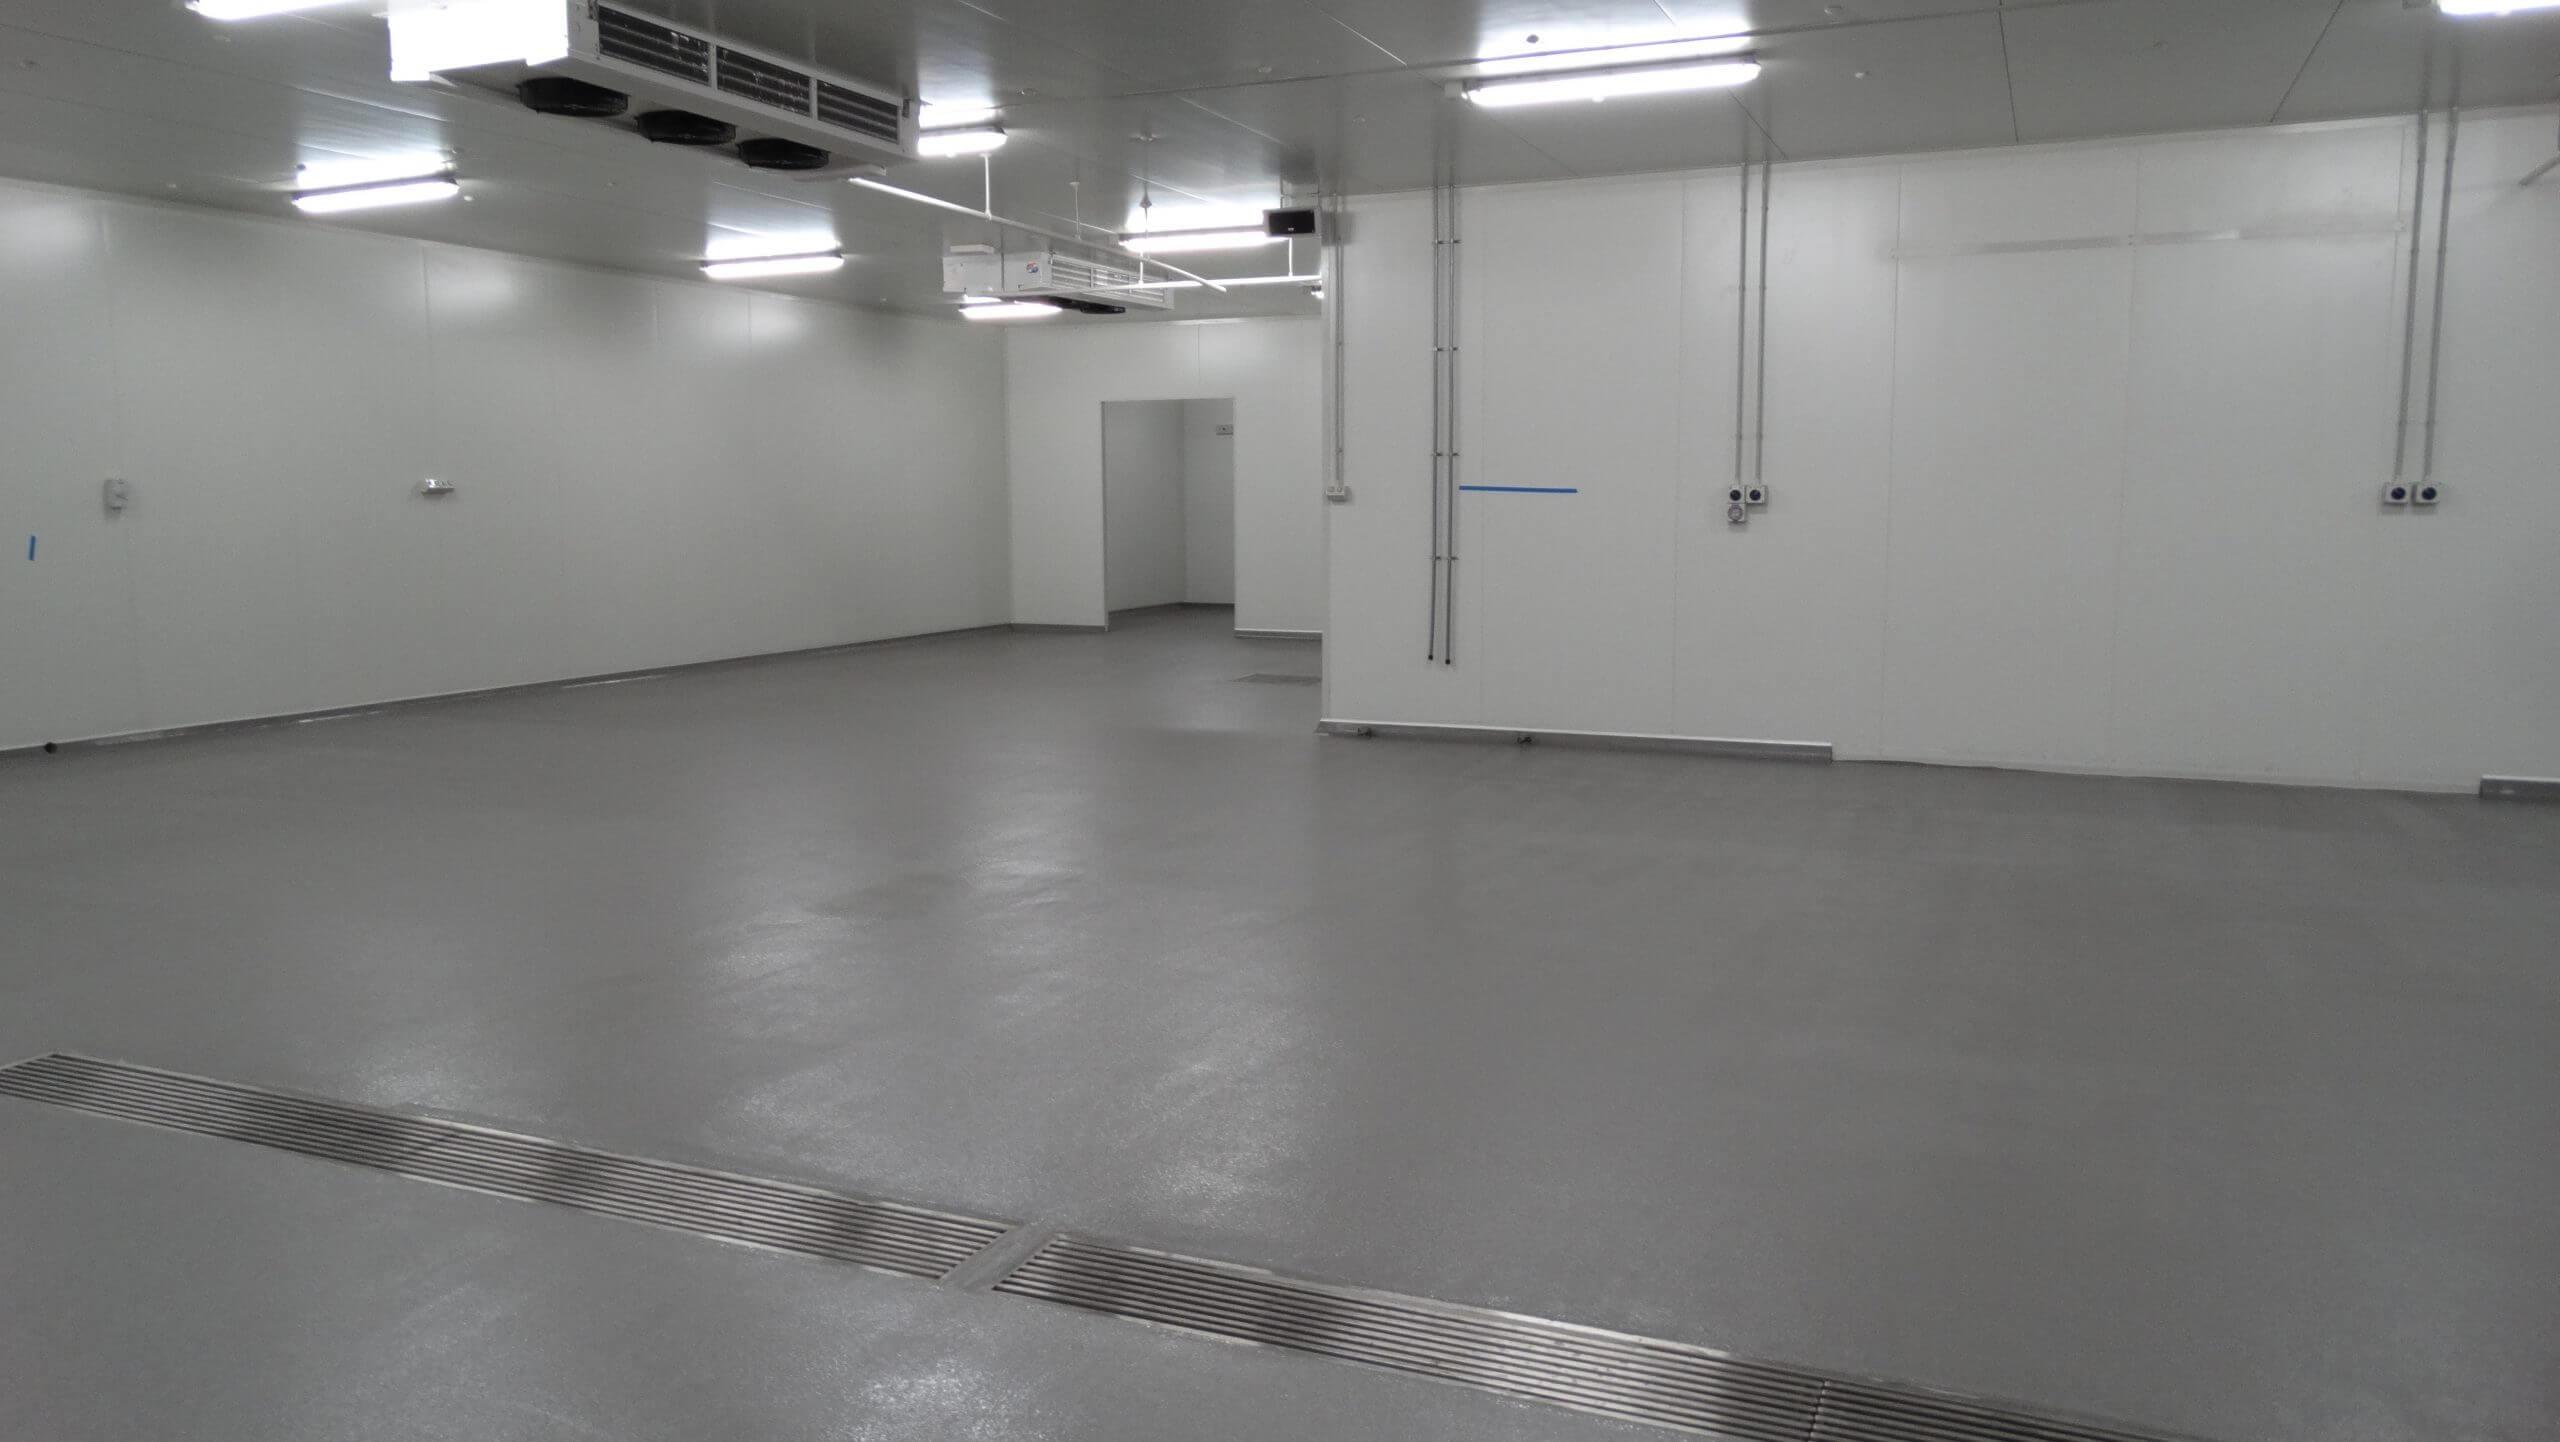 Epoxy Flooring - Building Maintenance - Remedial Building Services